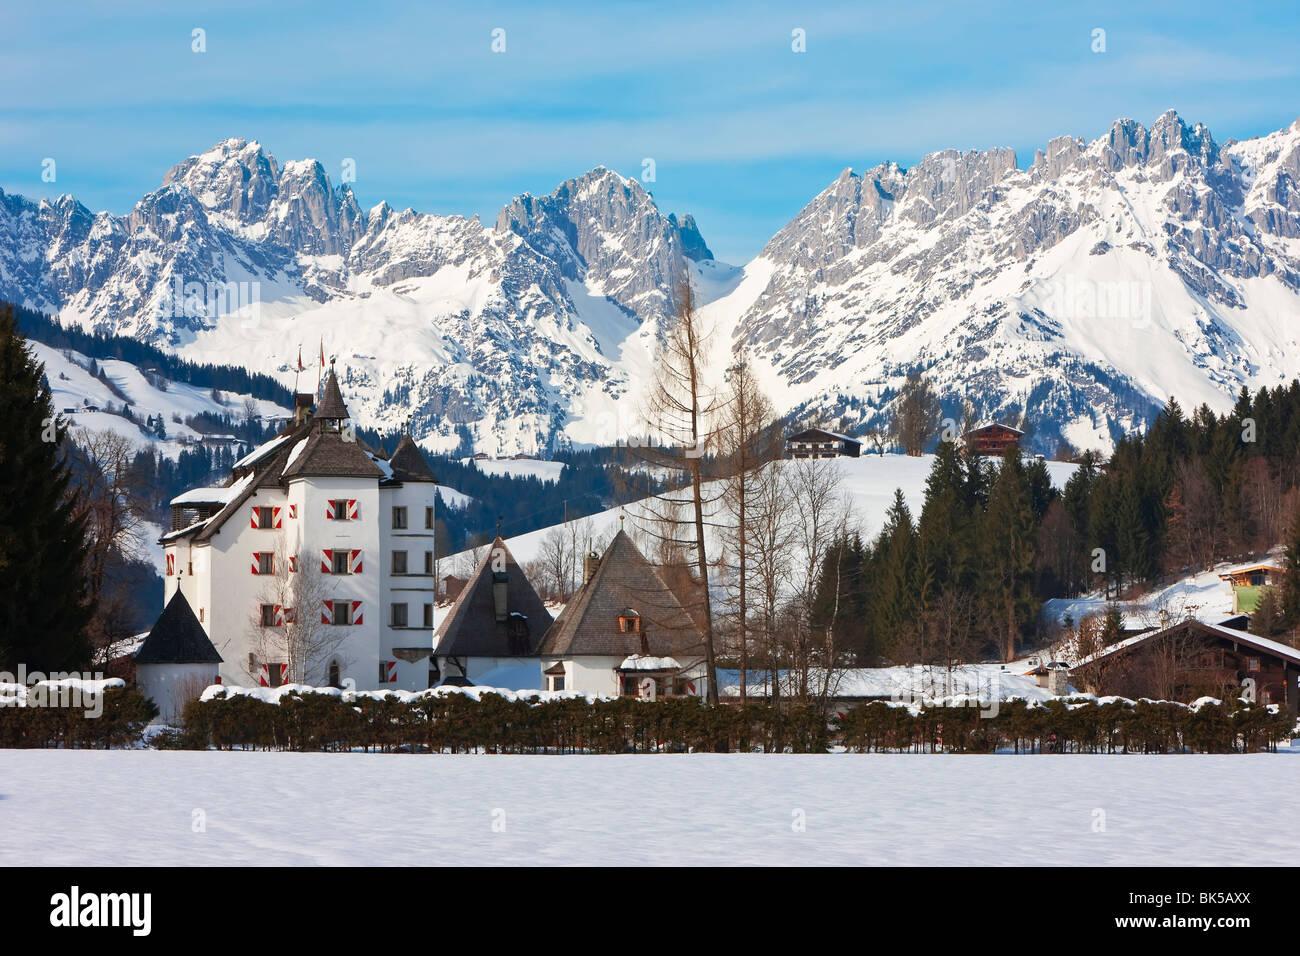 Kitzbuhel e la catena montuosa di Wilder Kaiser, Tirol, Alpi austriache, Austria, Europa Immagini Stock